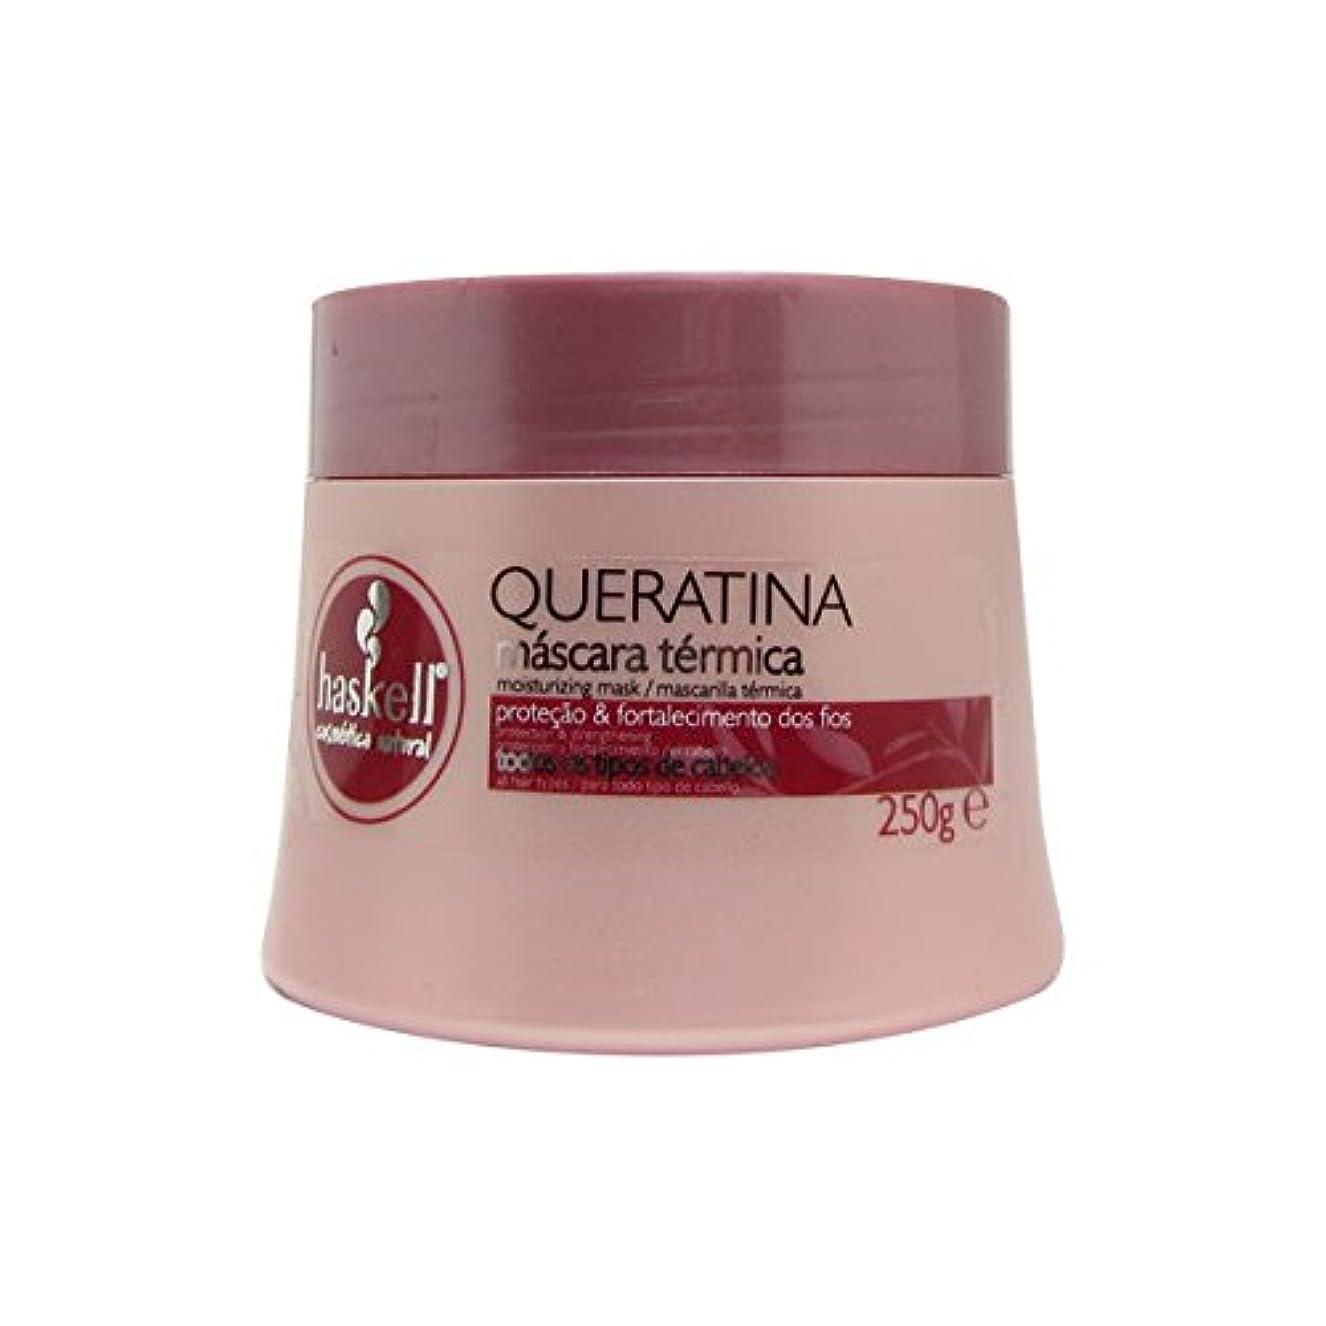 北背景会社Haskell Queratina Hair Mask 250g [並行輸入品]